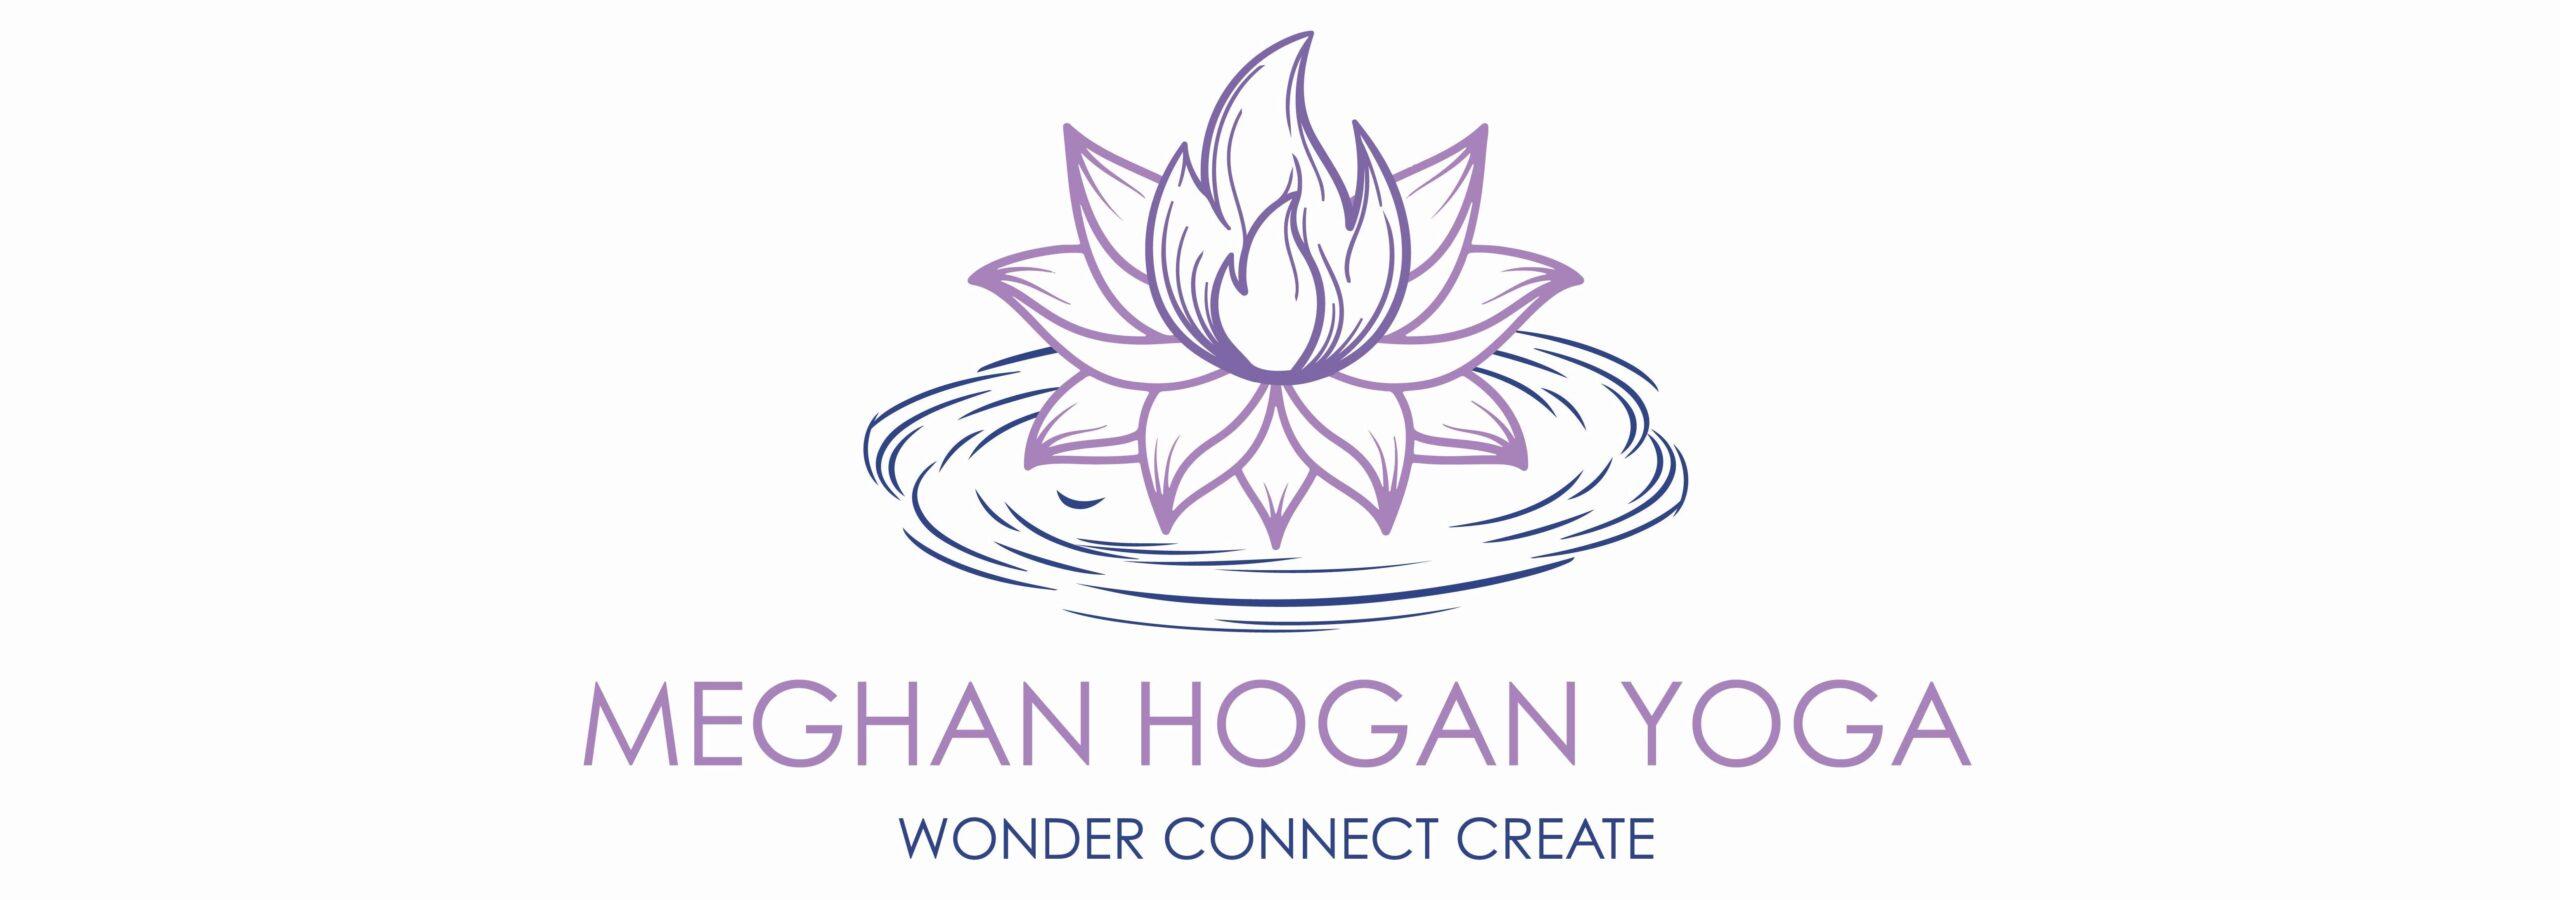 Meghan Hogan Yoga